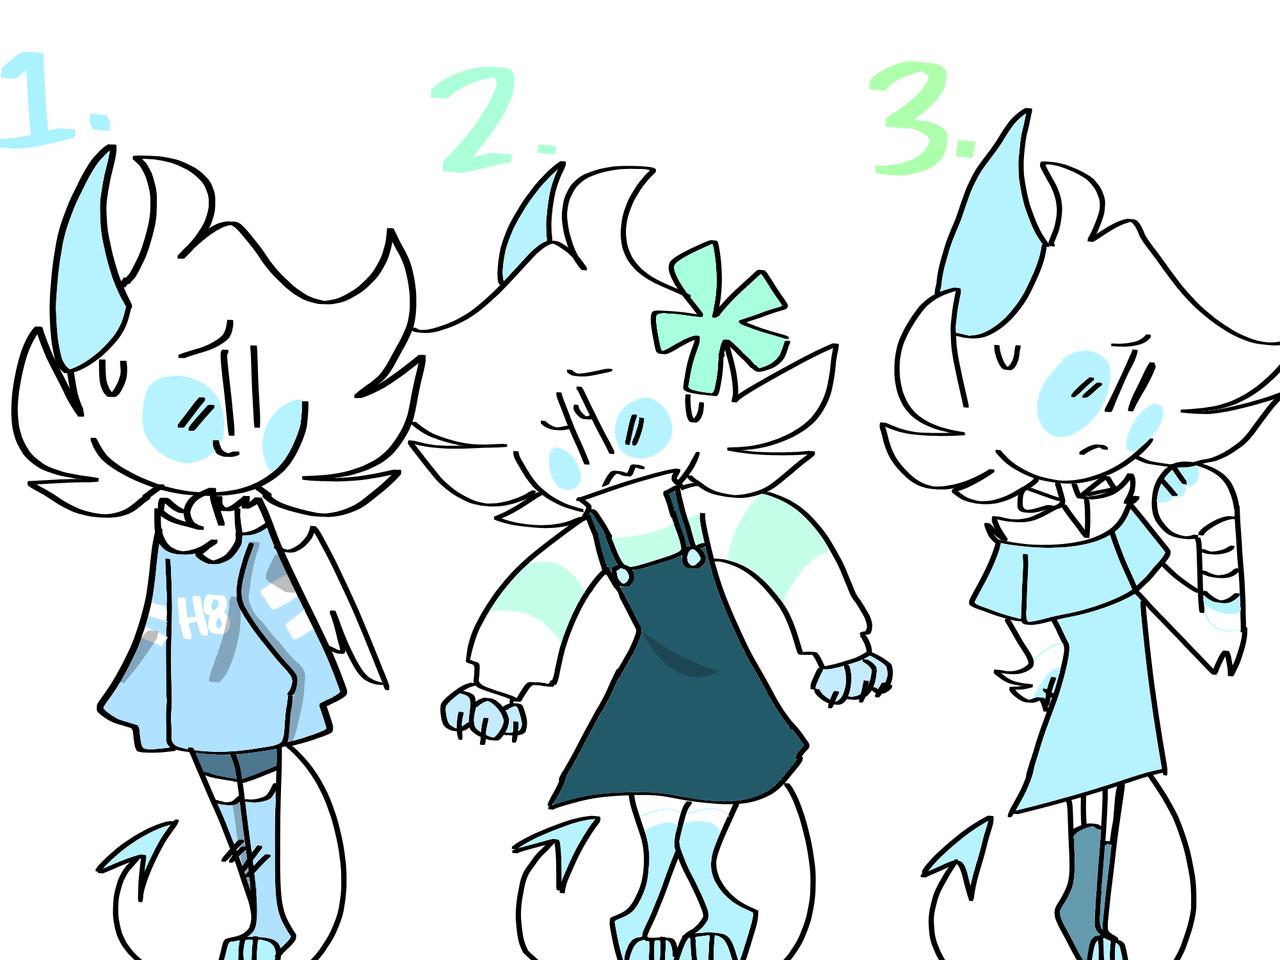 Pick one i want to change outfits xddd Illust of kiielmao medibangpaint